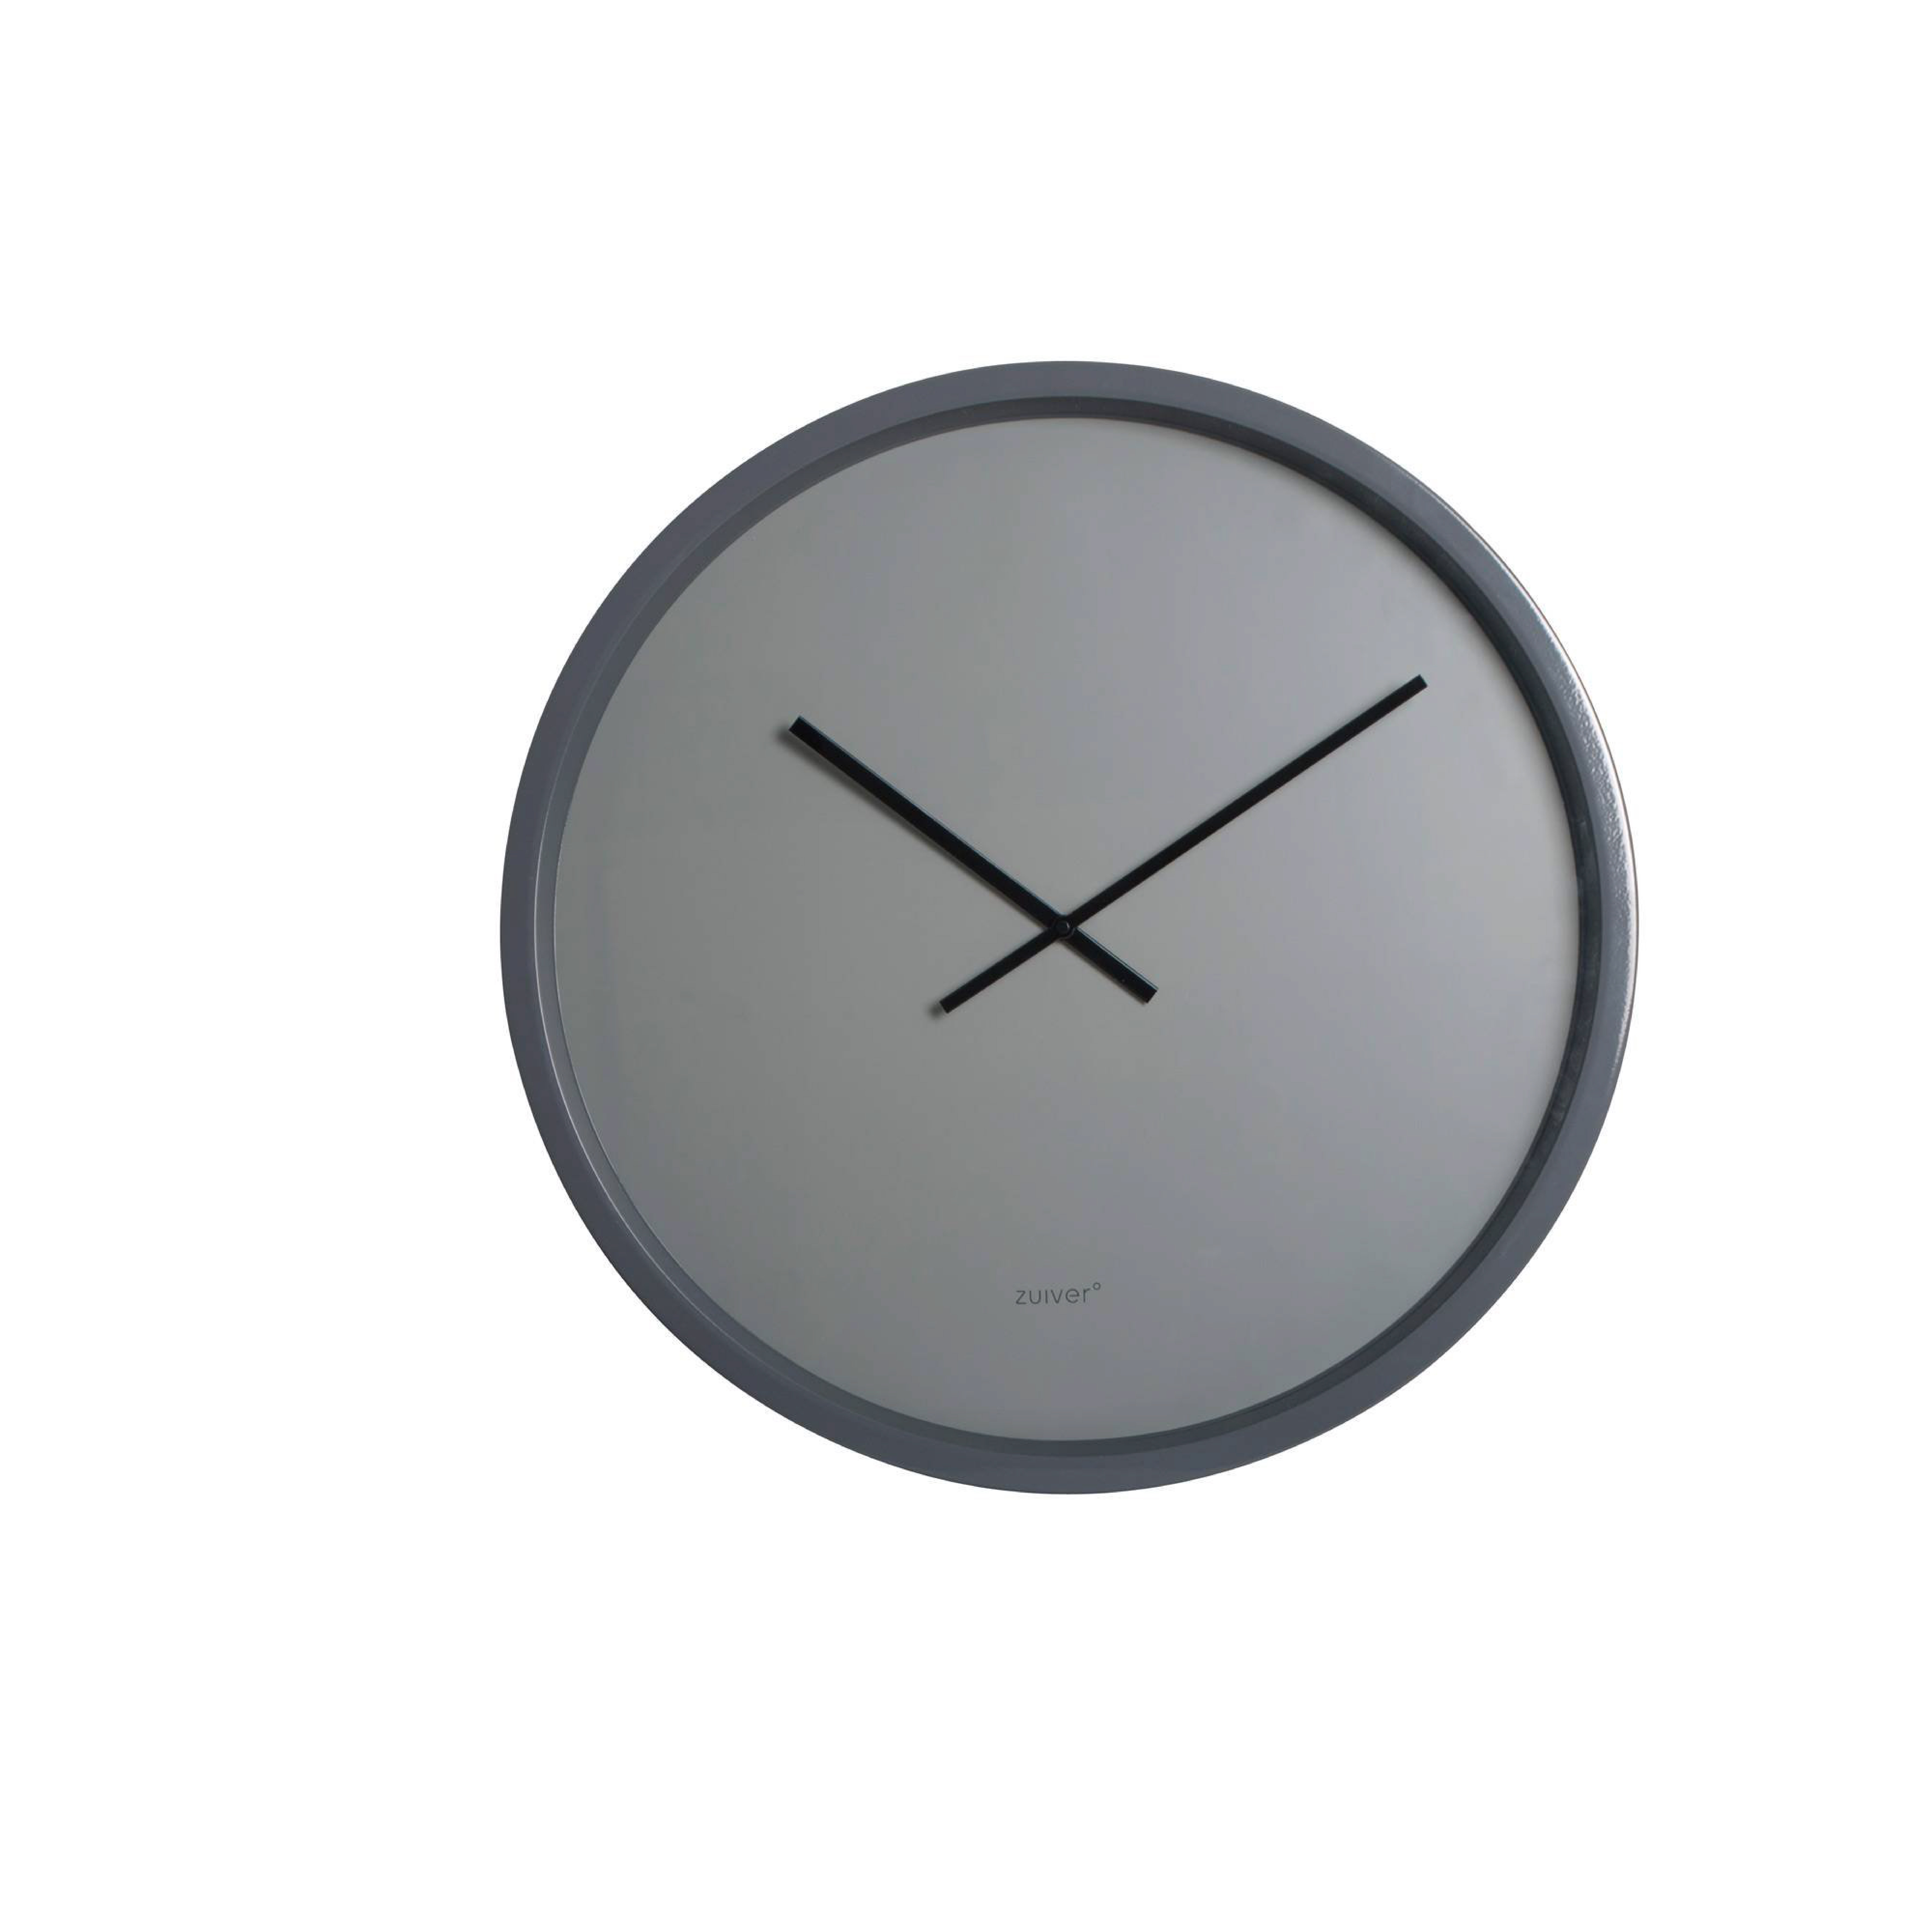 HORLOGE TIME BANDIT ZUIVER SUR 3SUISSES.FR (grise) – 139€